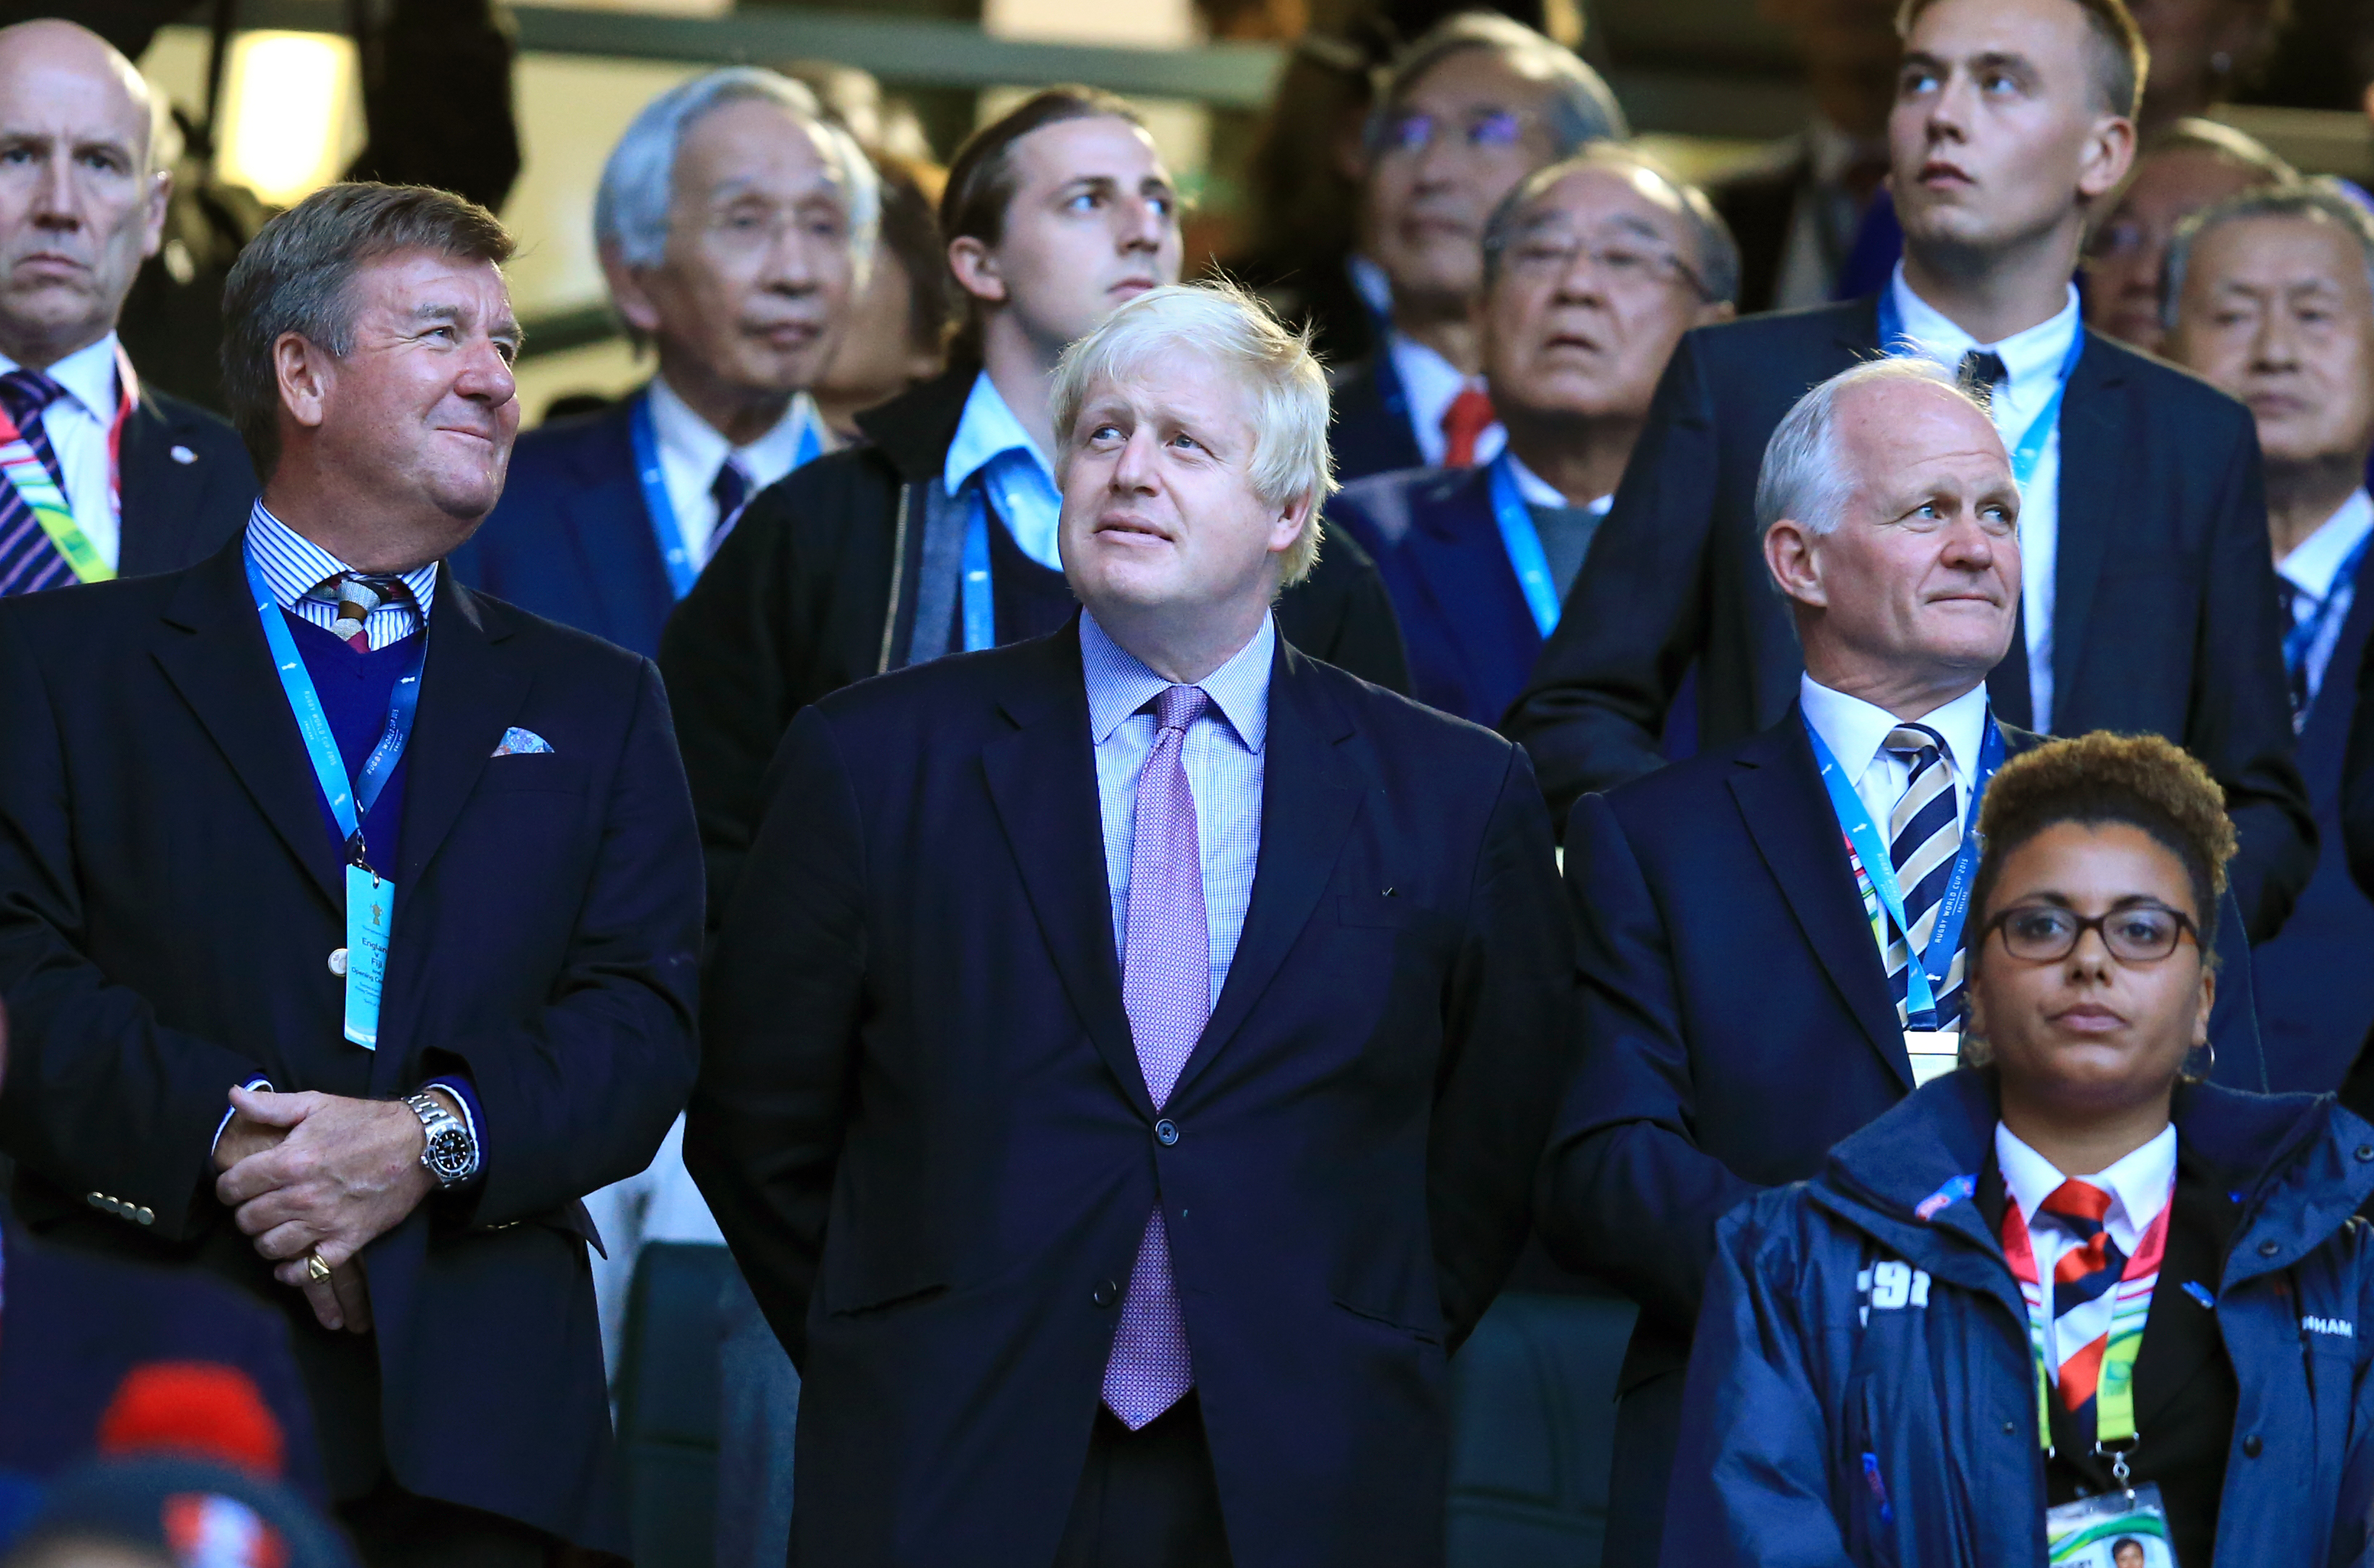 Mayor of London Boris Johnson before the Rugby World Cup match at Twickenham Stadium, London.